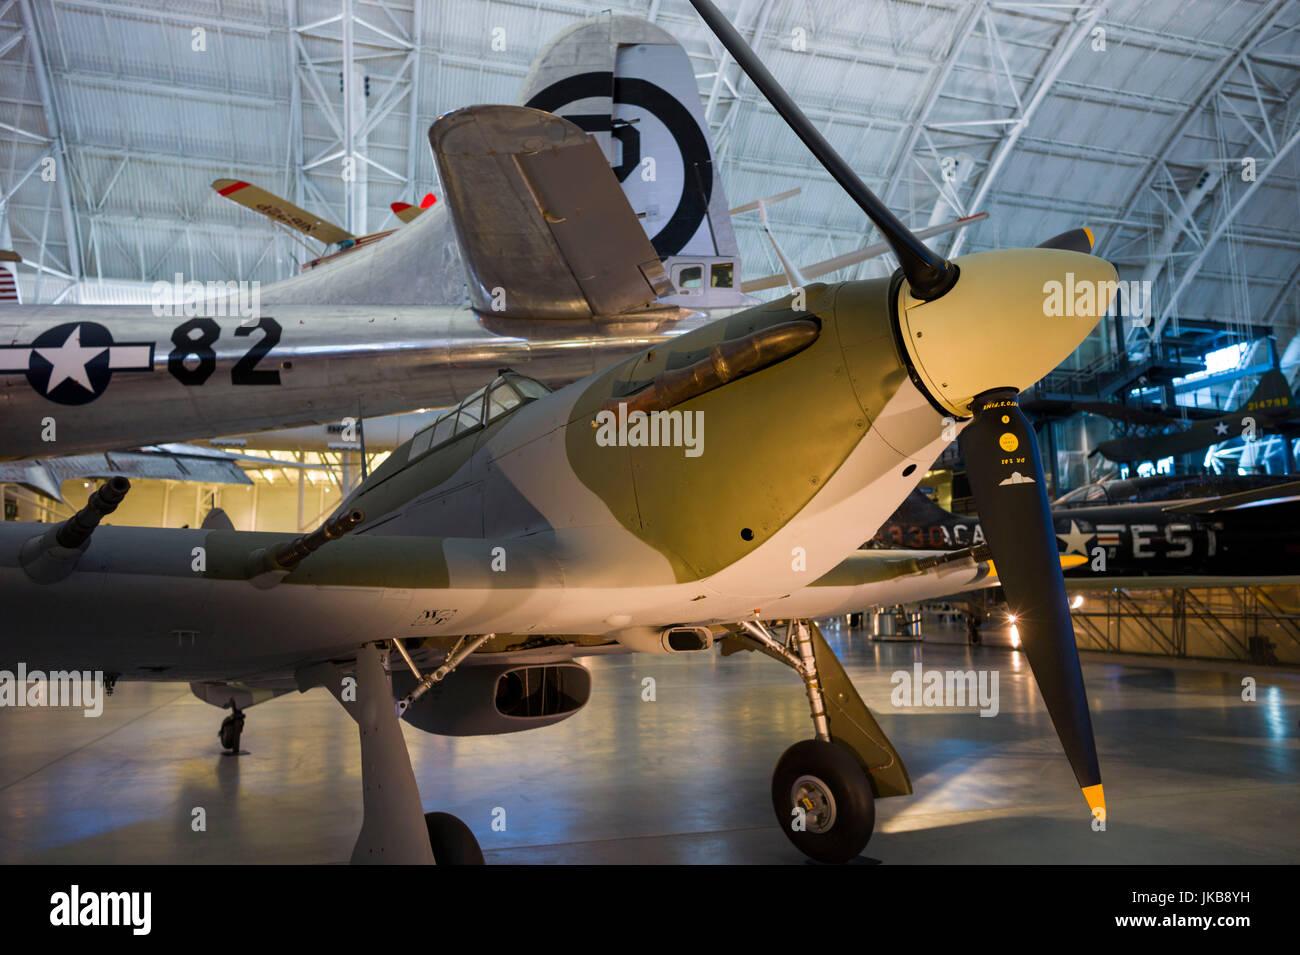 USA, Virginia, Herdon, National Air and Space Museum, Steven F. Udvar-Hazy Center, air museum, WW2-era British Hawker - Stock Image